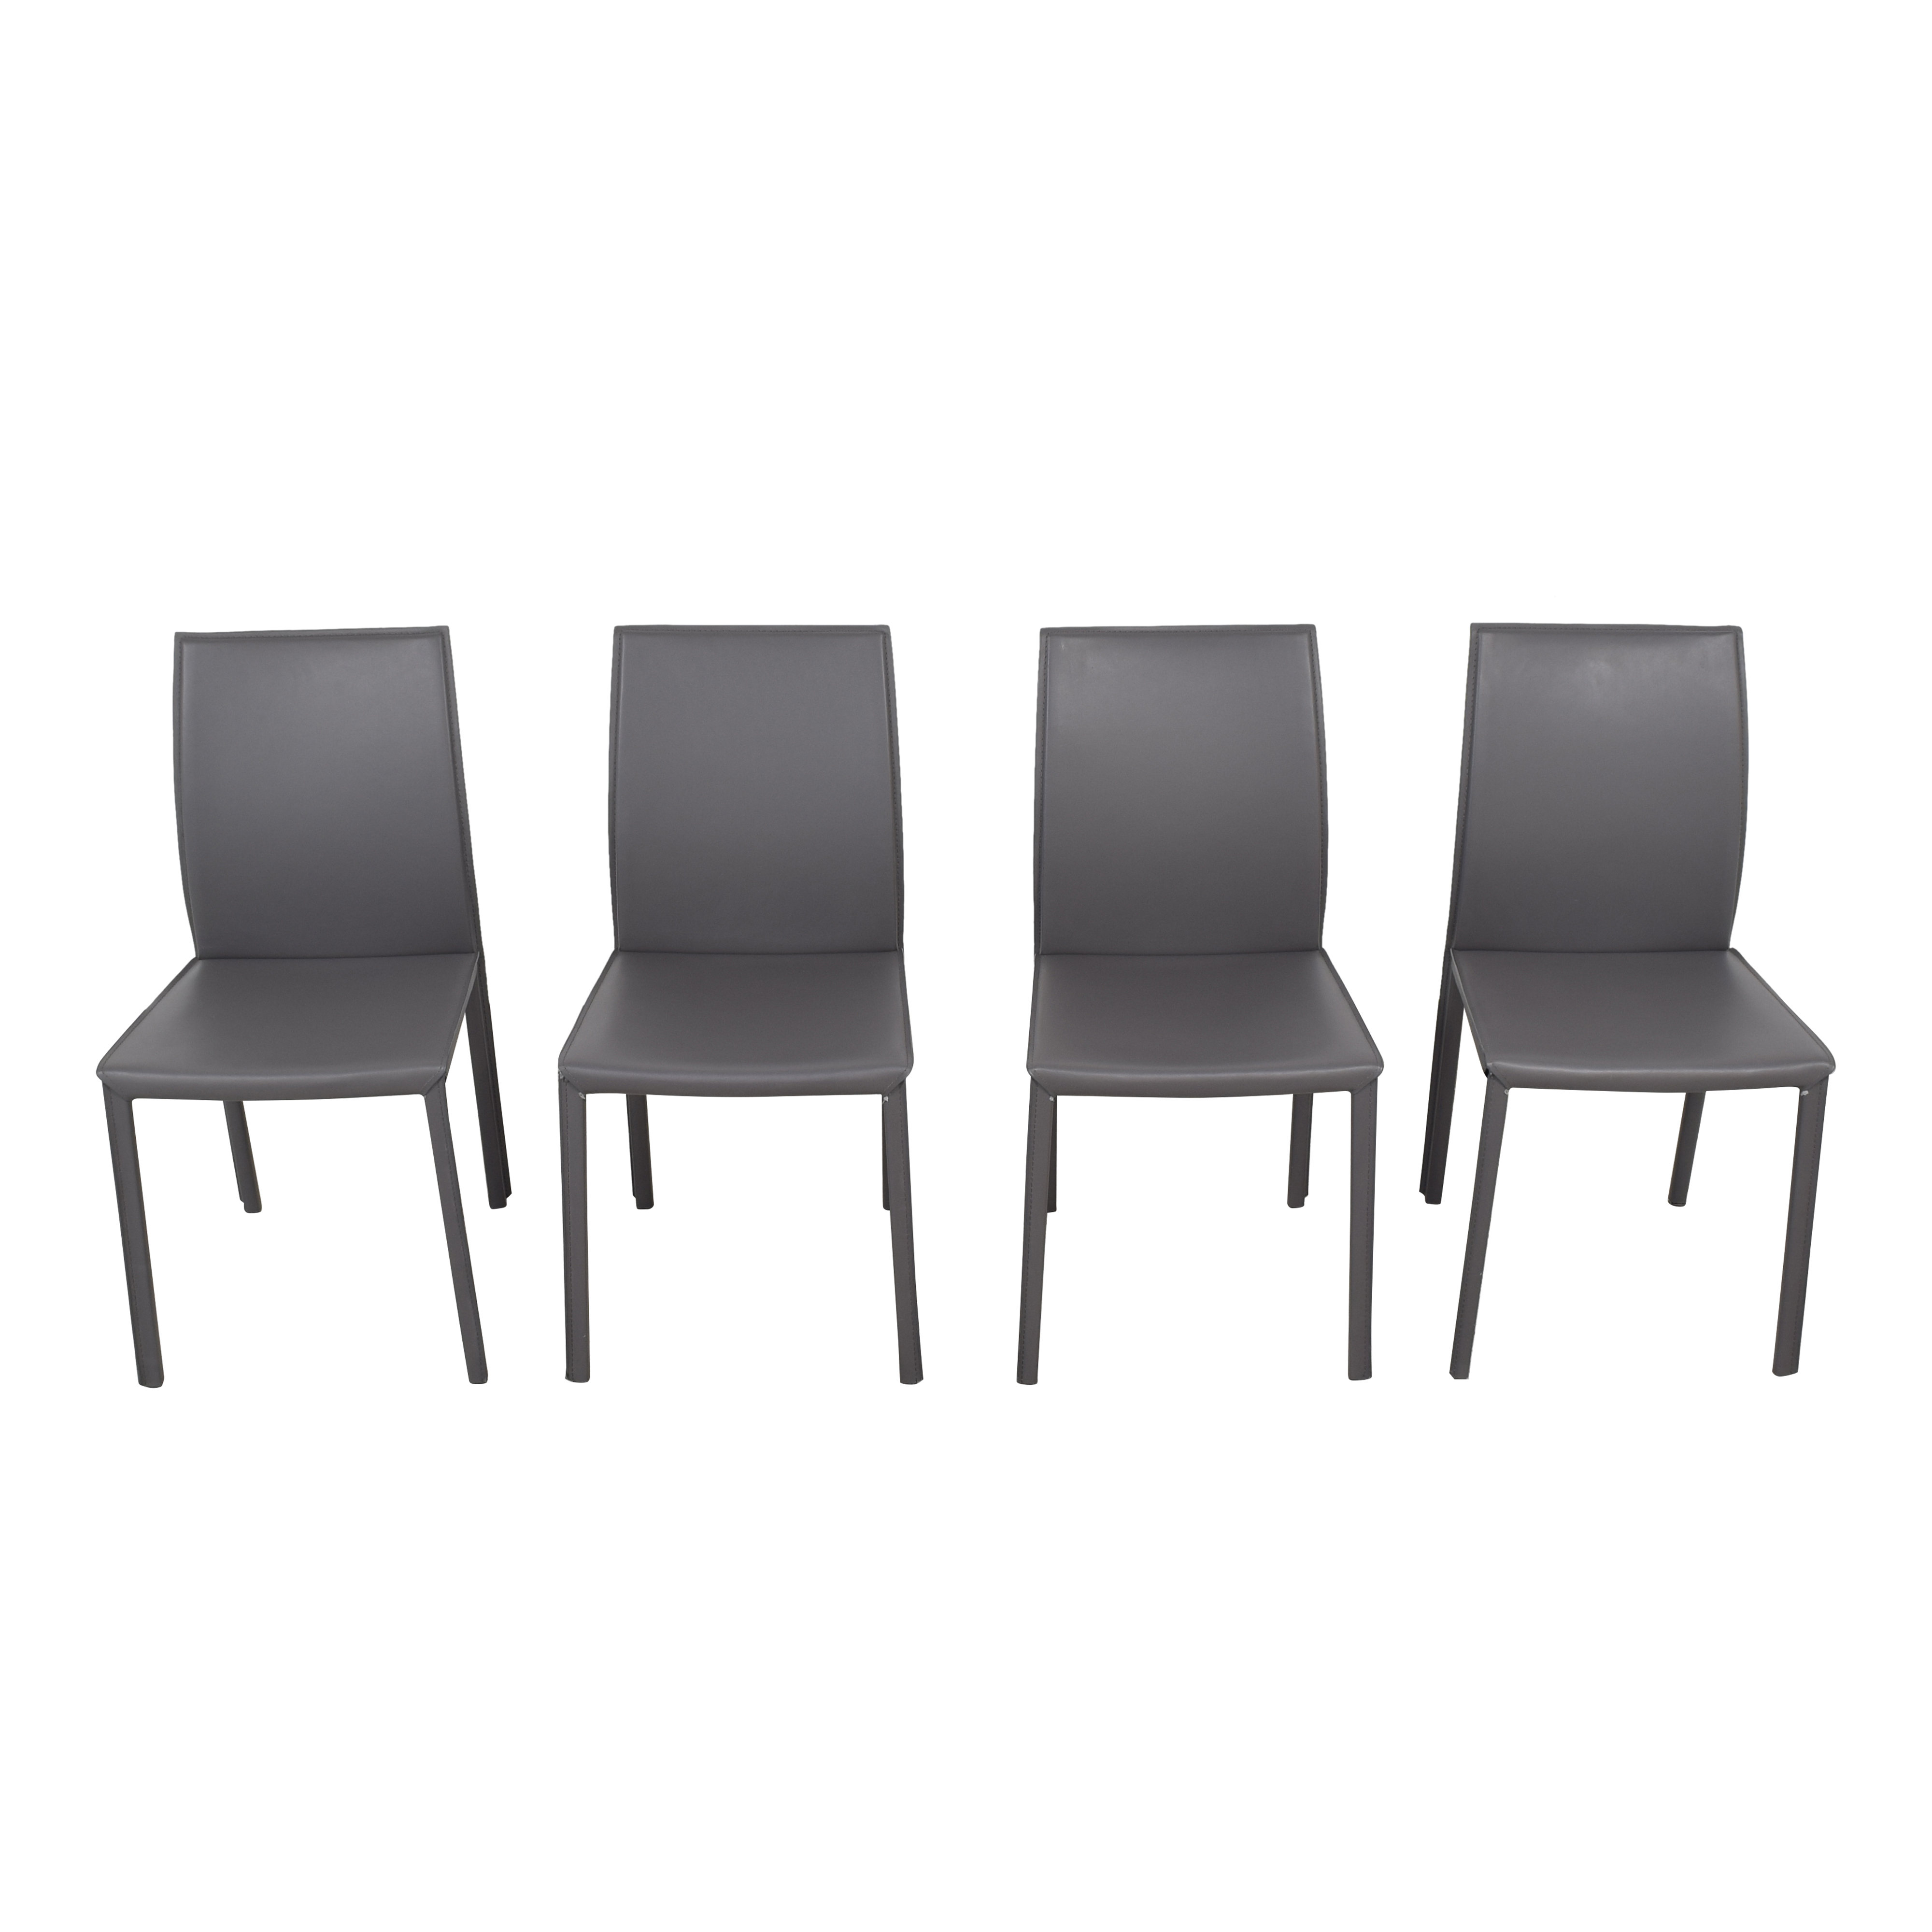 BoConcept BoConcept Zarra Dining Chairs price